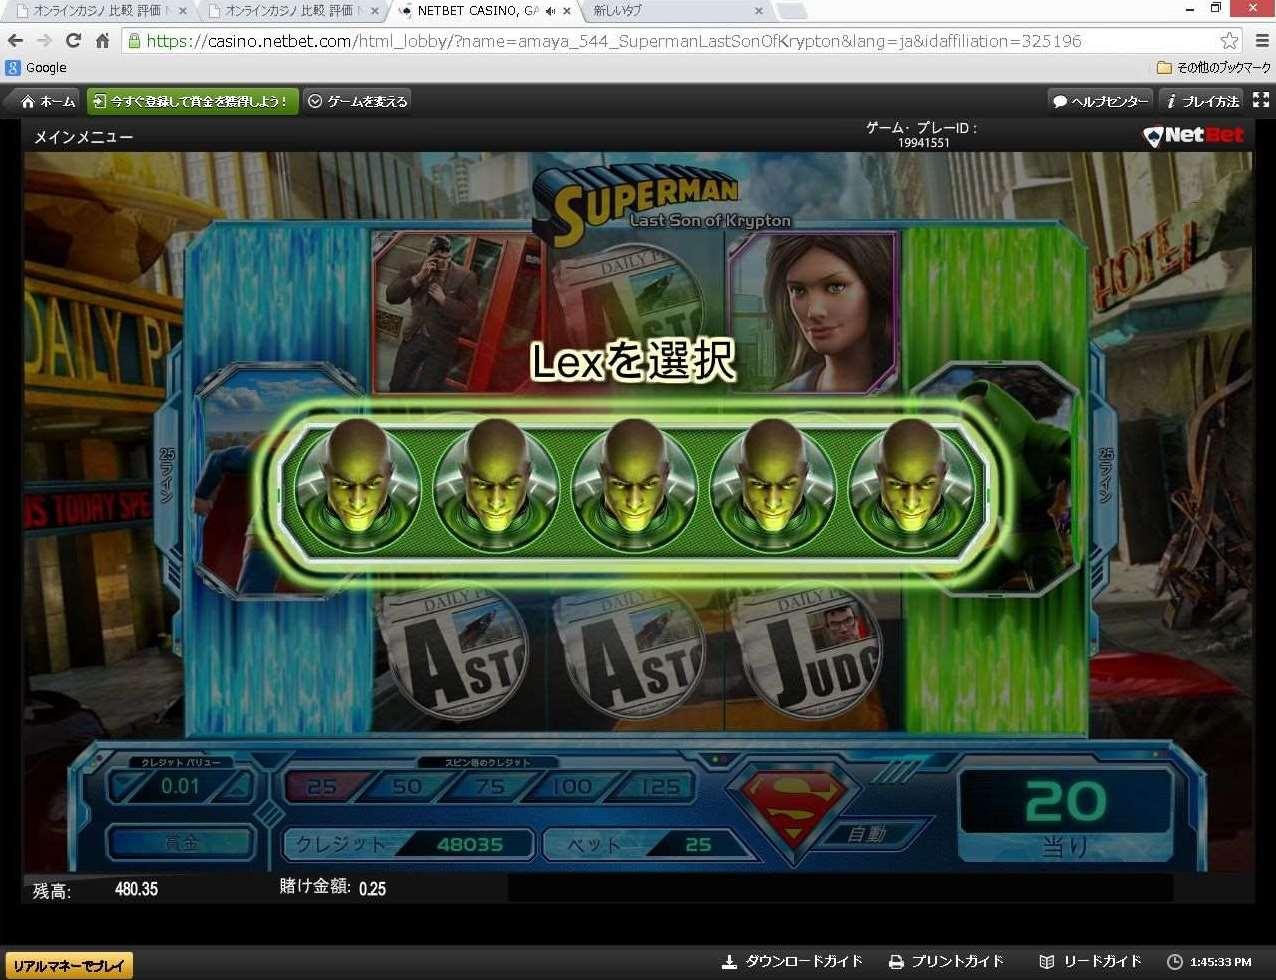 Lex Luther フローズンワイルドフリーゲーム3